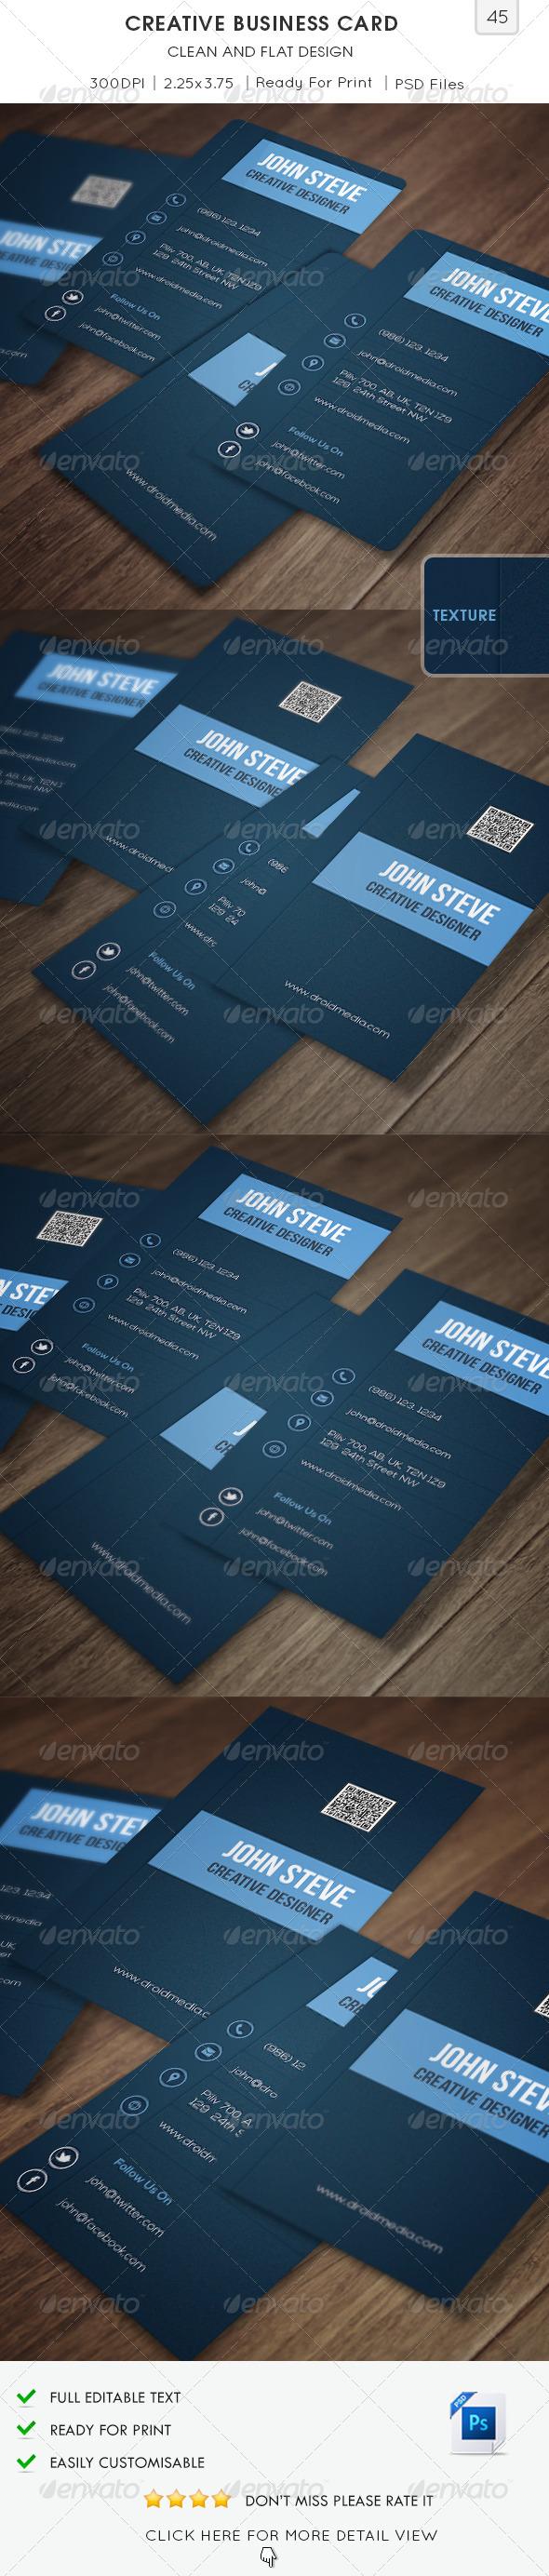 Creative Business Card v45 - Creative Business Cards